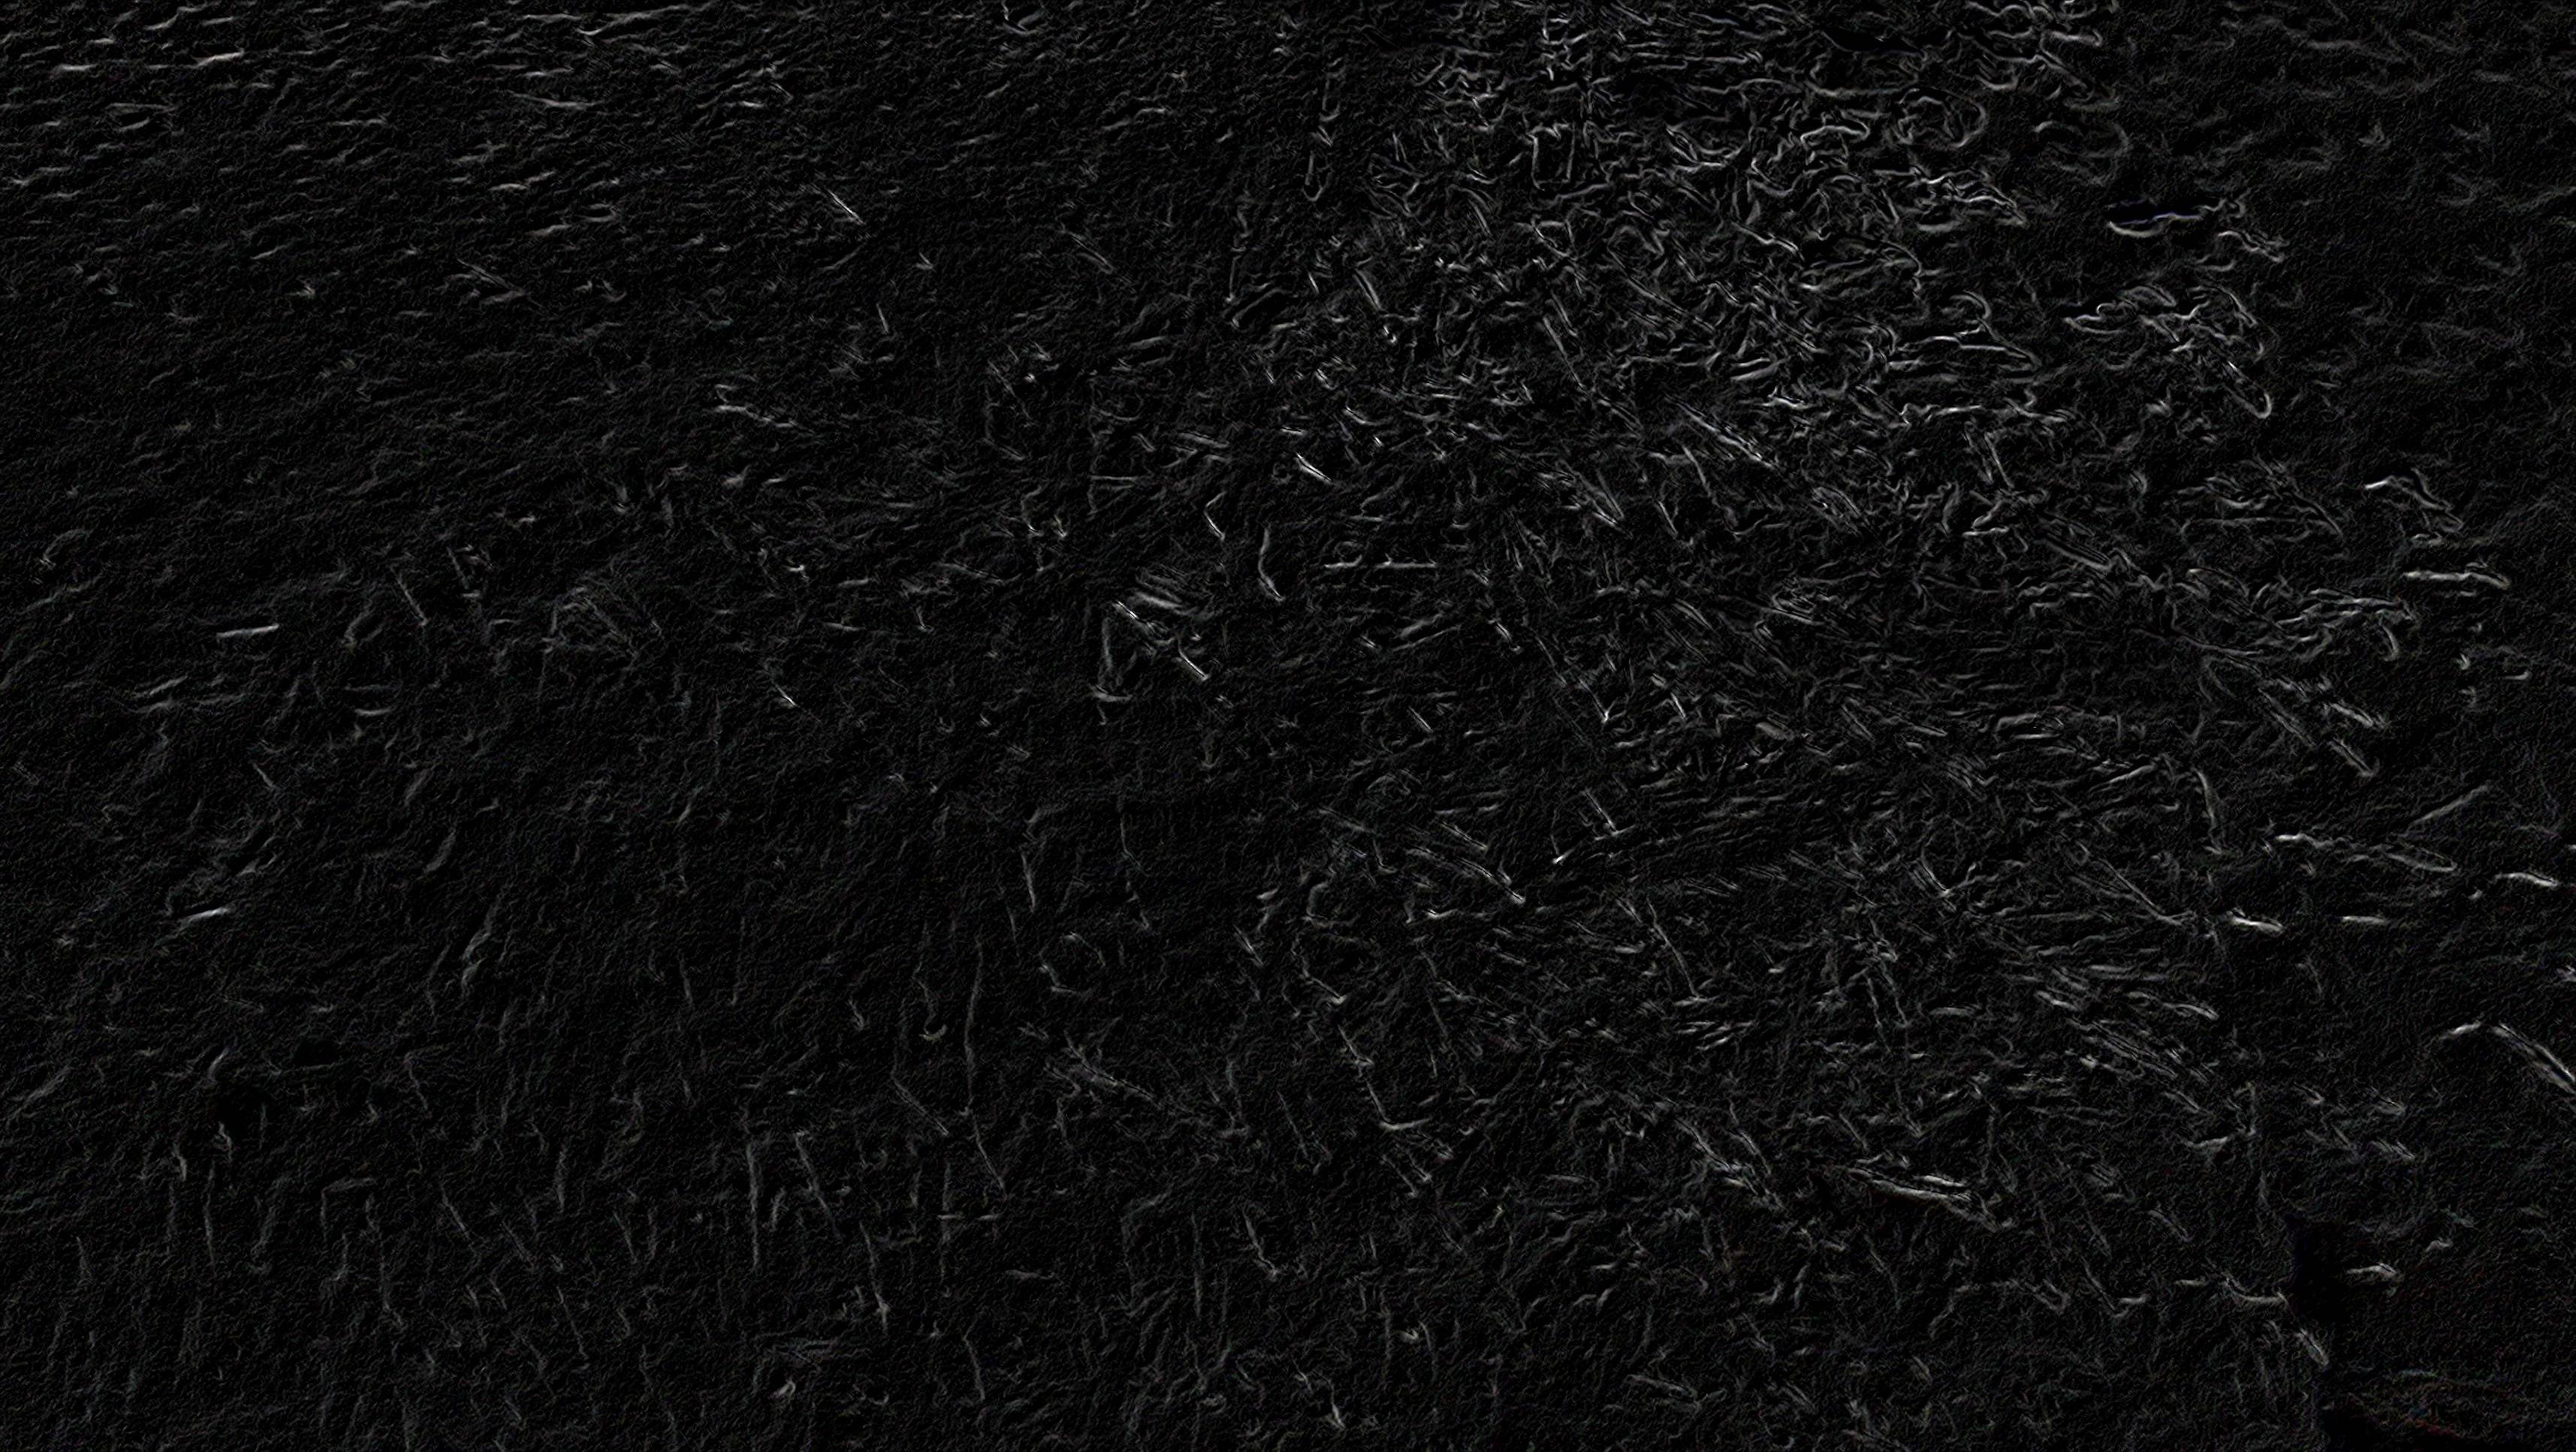 Black Desktop Wallpaper Hd Pinterest